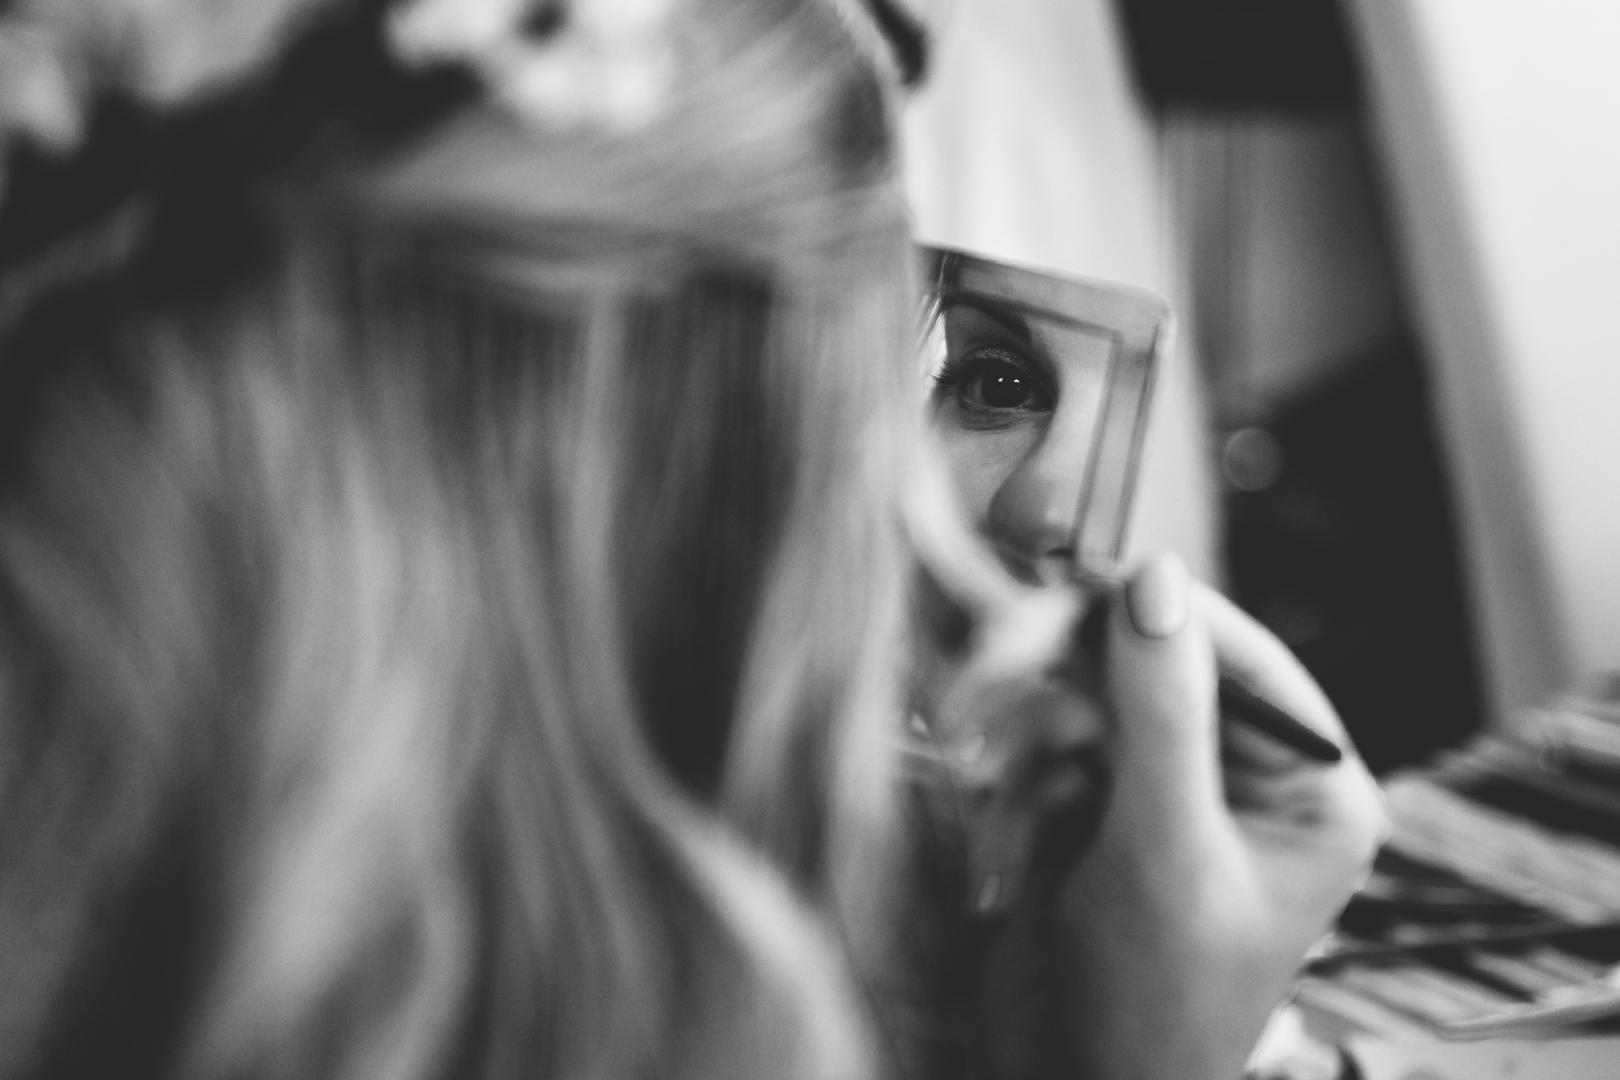 Photographe Mariage Alsace - Photographe Mariage Haut-Rhin – Photographe Mariage Mulhouse – Photographe Mariage Colmar – Photographe Mariage Belfort - Photographe Mariage Alternatif Alsace - Photographe Mariage Alternatif Mulhouse - Photographe Mariage Alternatif Haut-Rhin - Wedding Photographer - Bertrand DISDIER Photographe